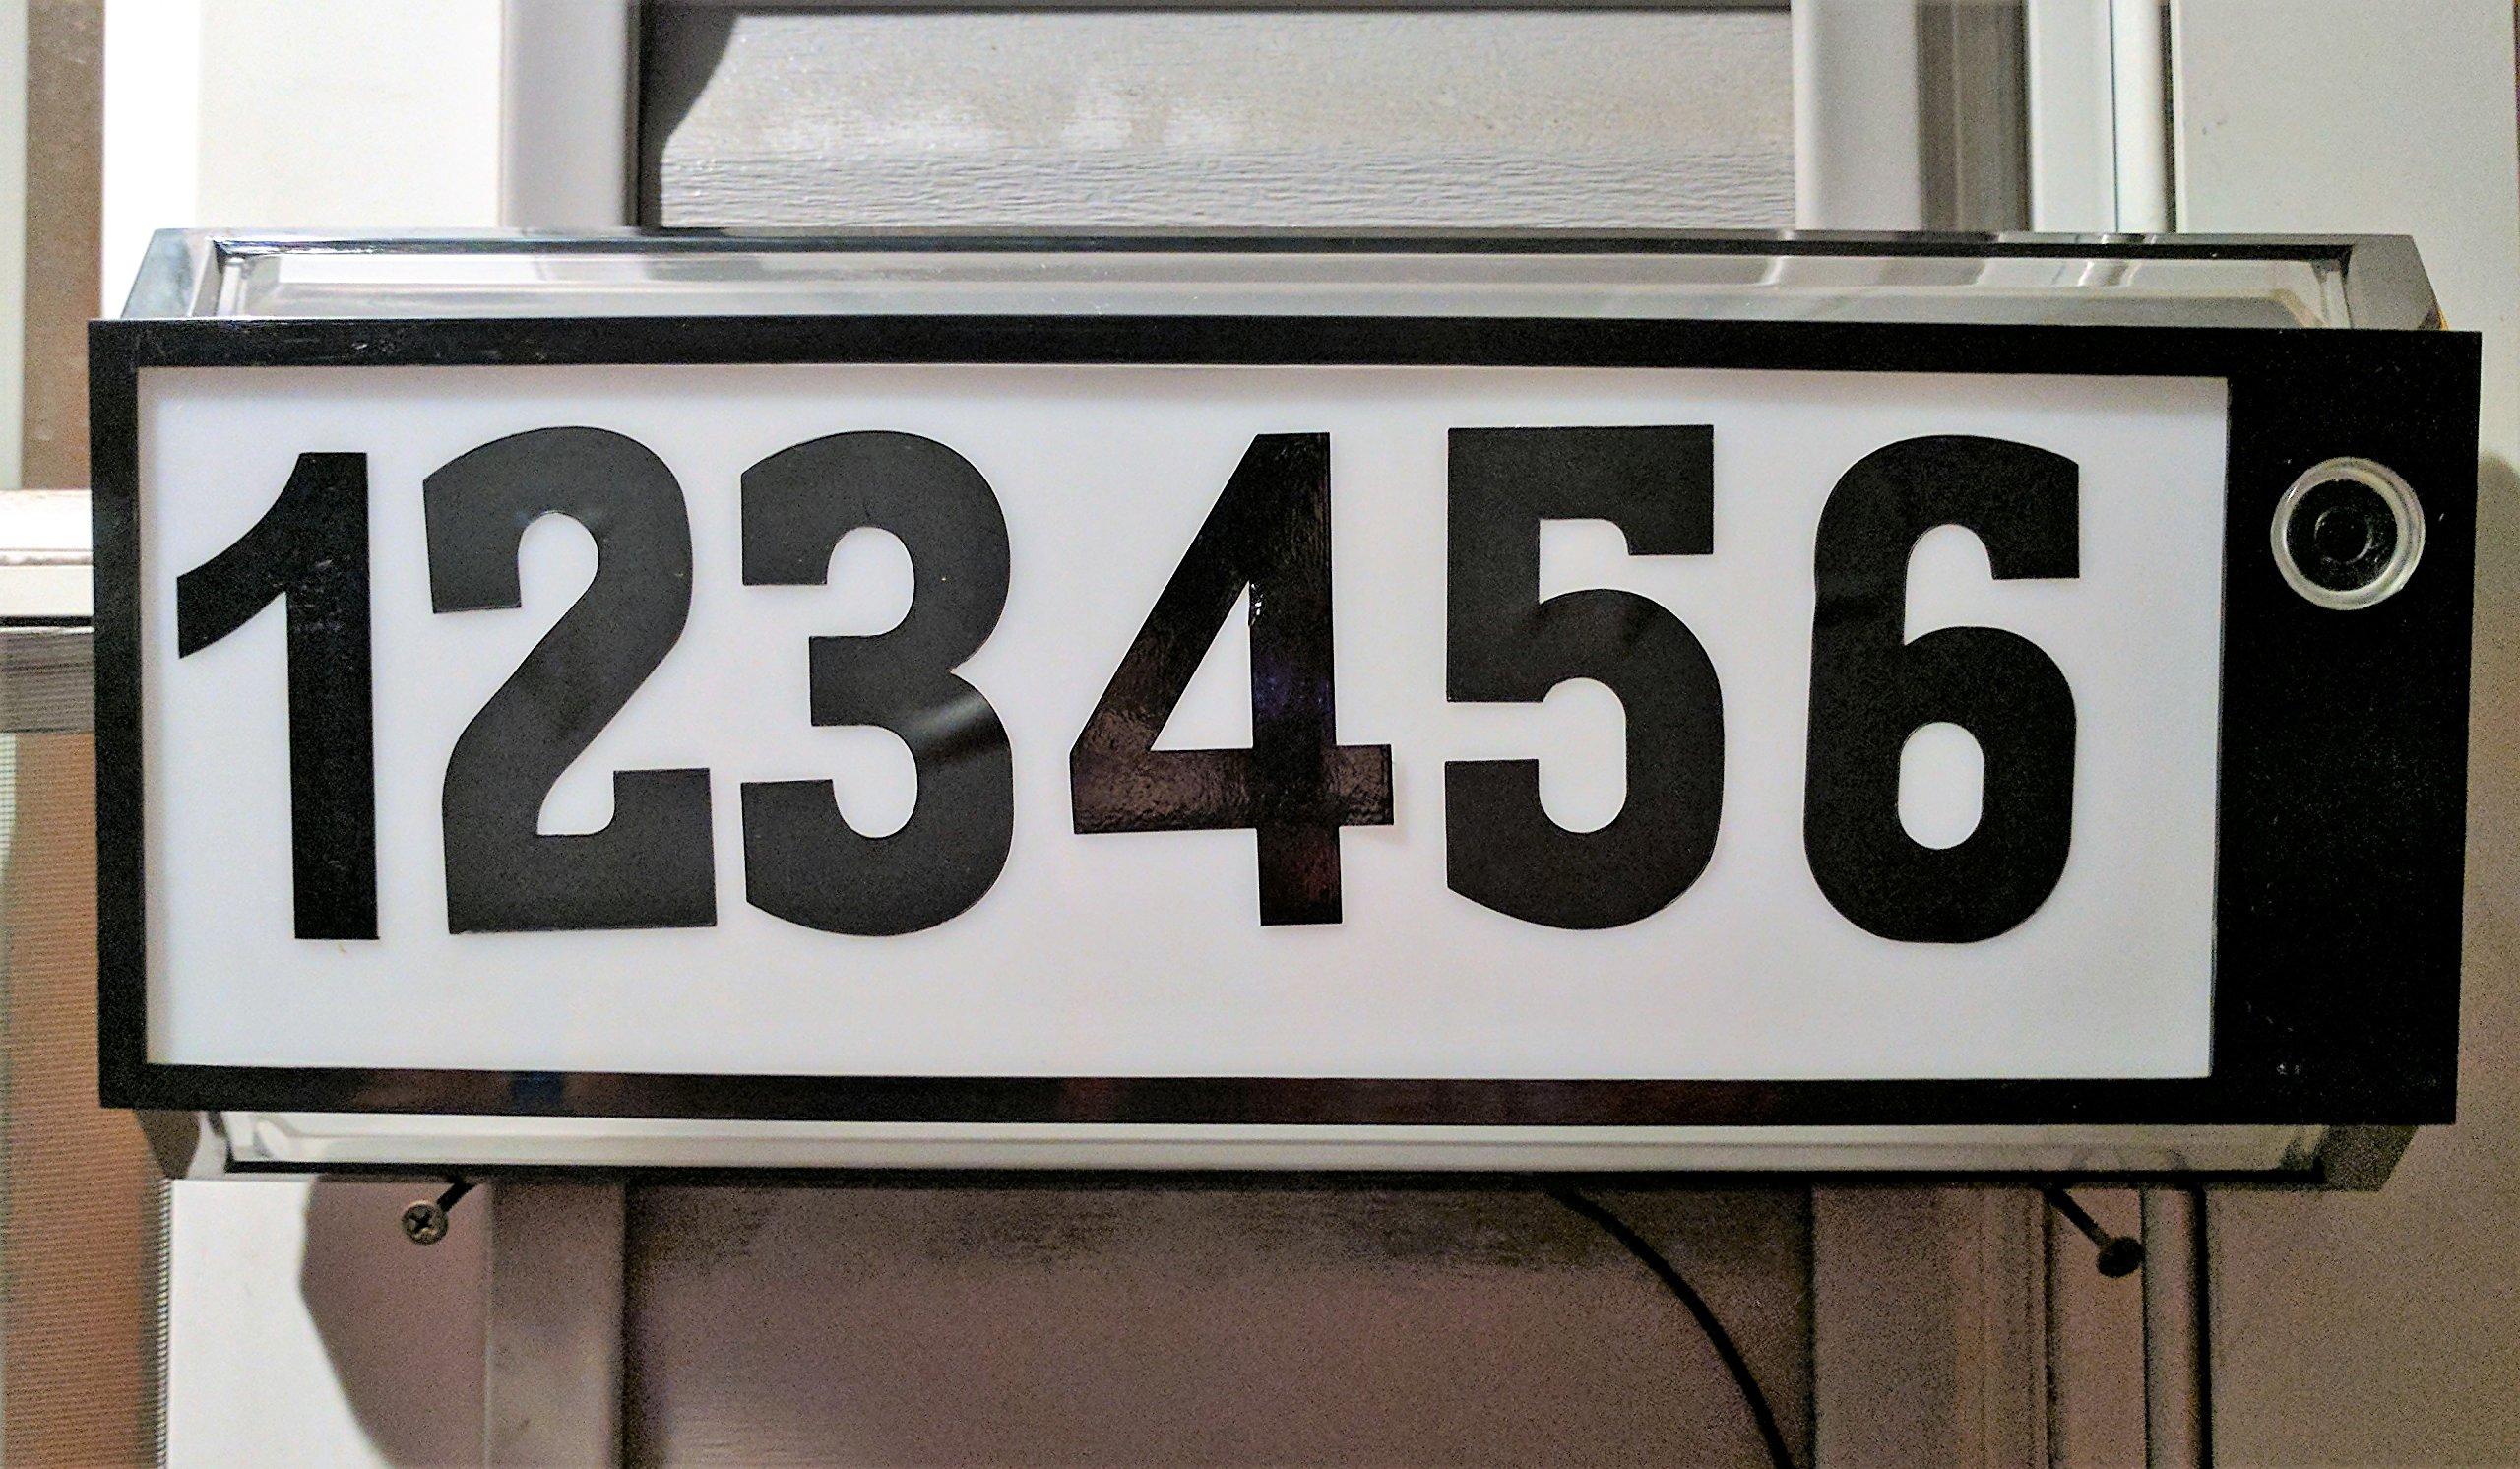 110-120 Volt Illuminated Address Light (Black) by Address Light Store